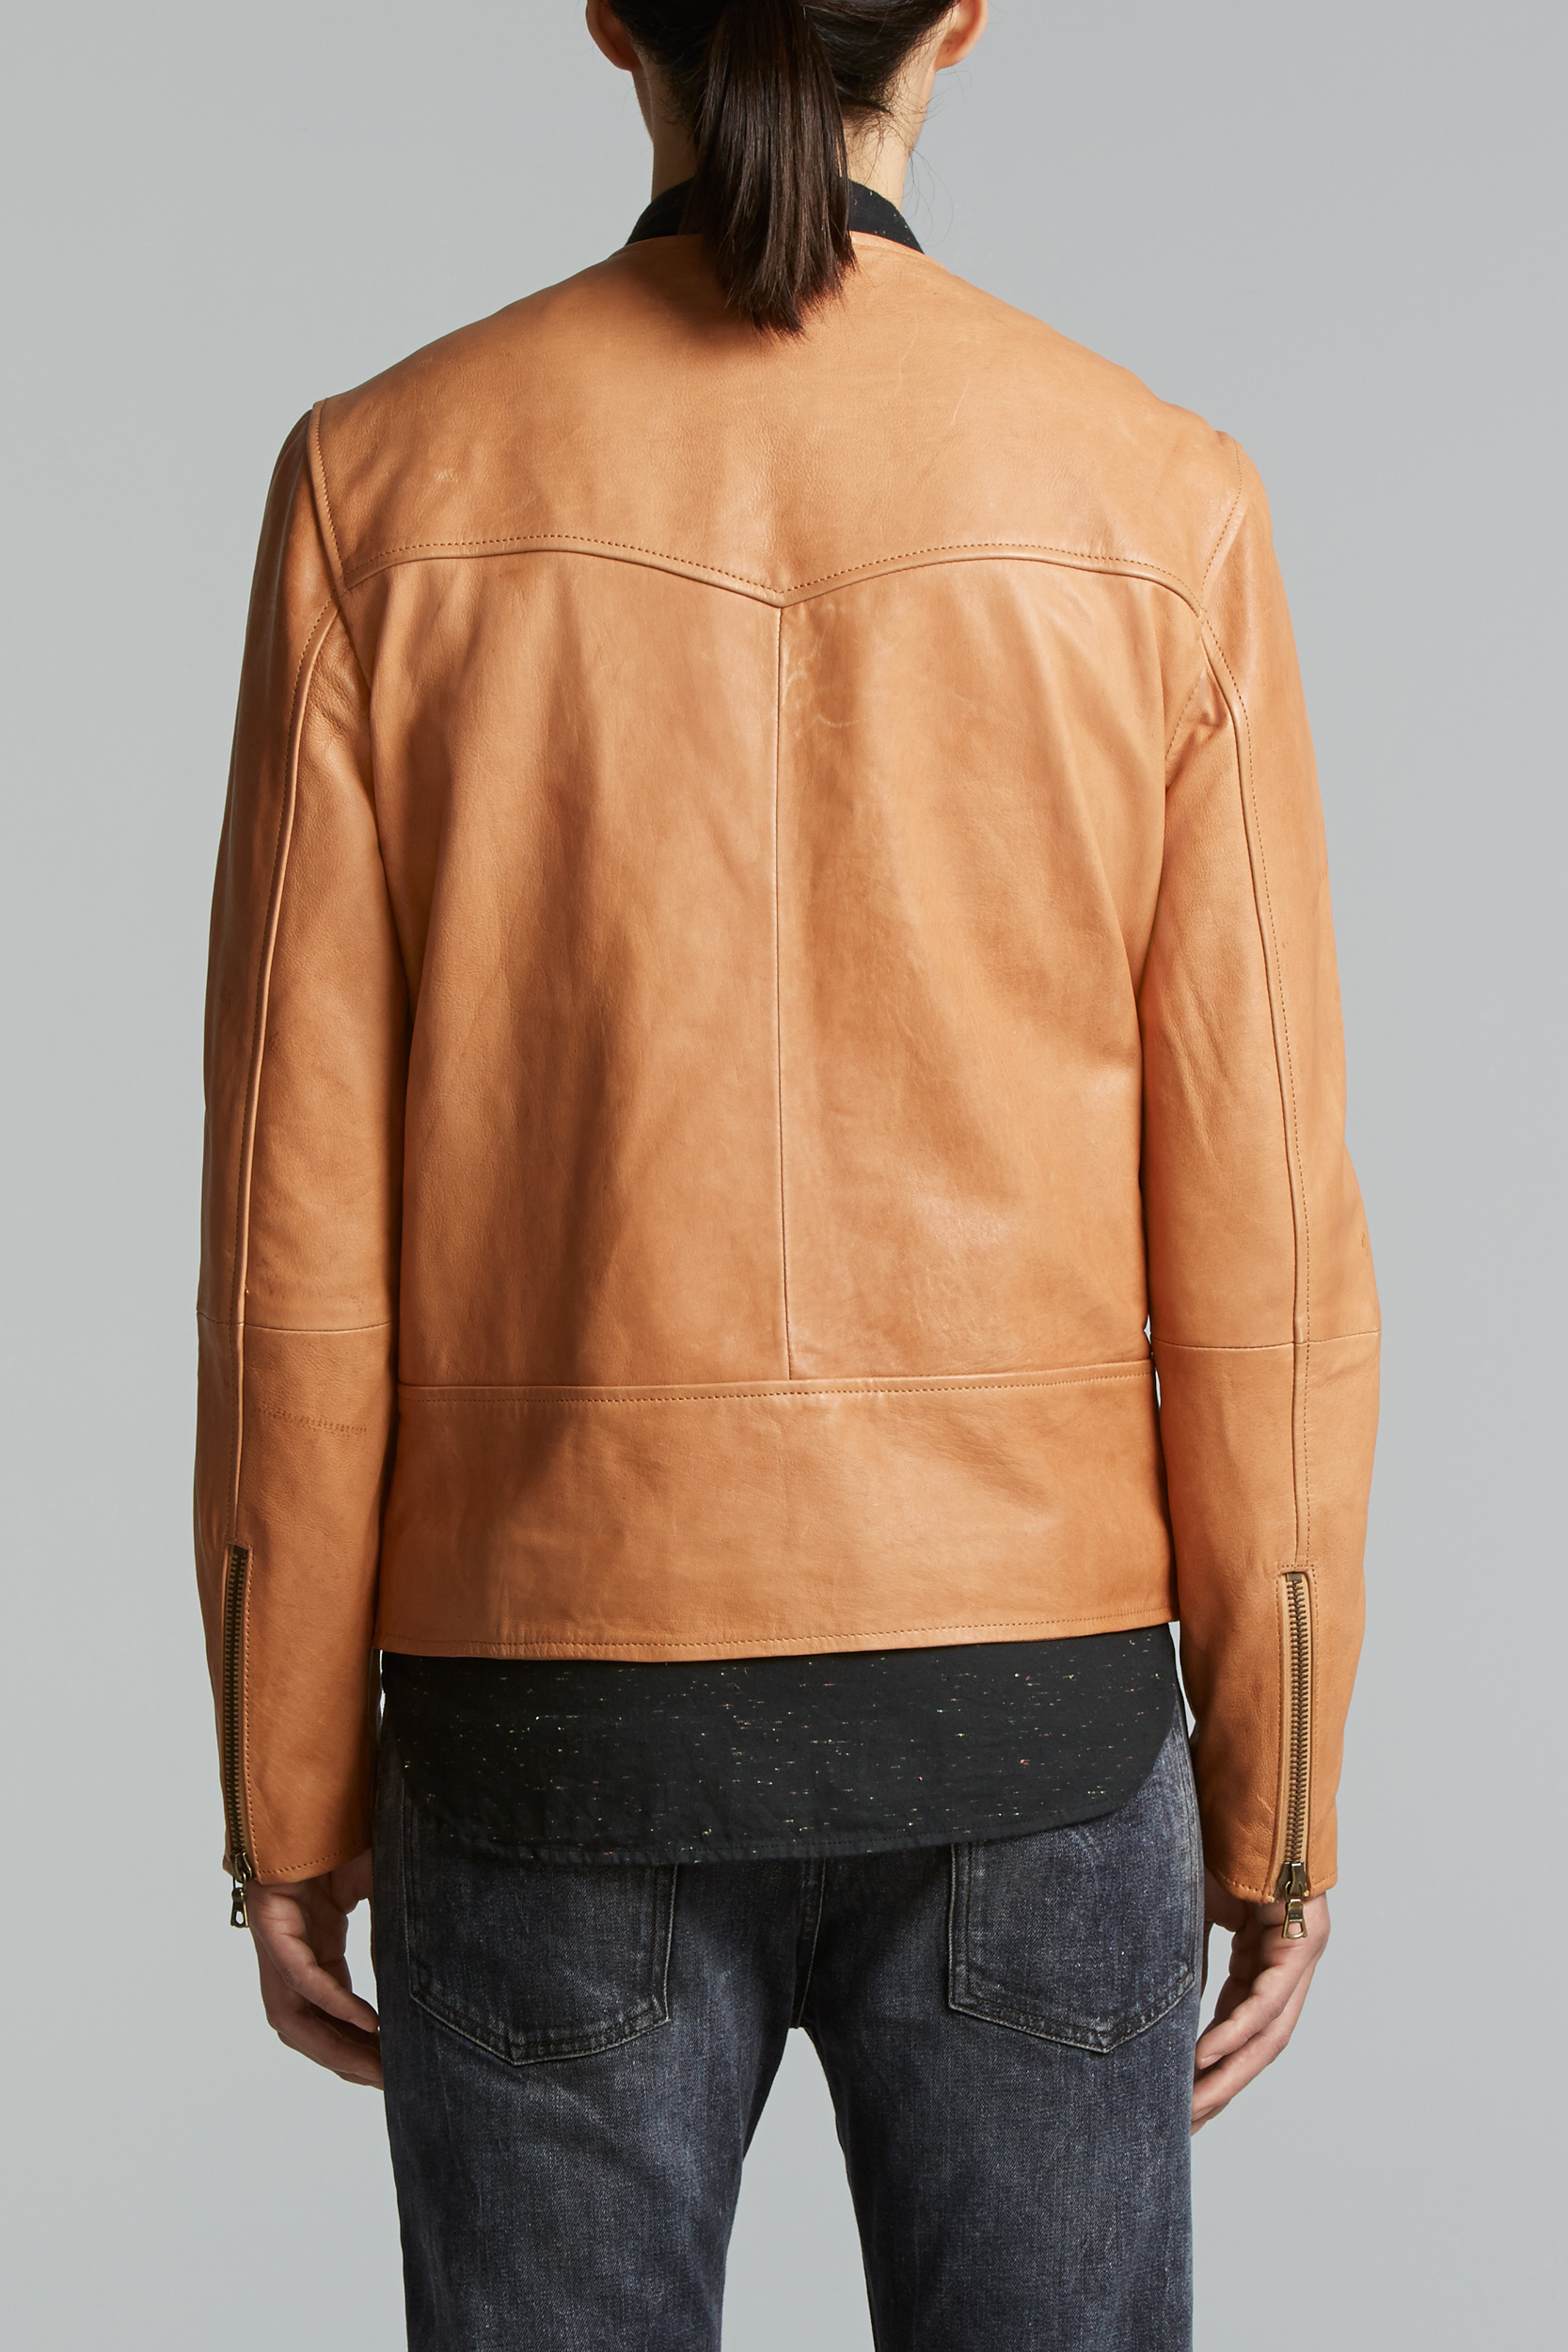 levis racer jacket